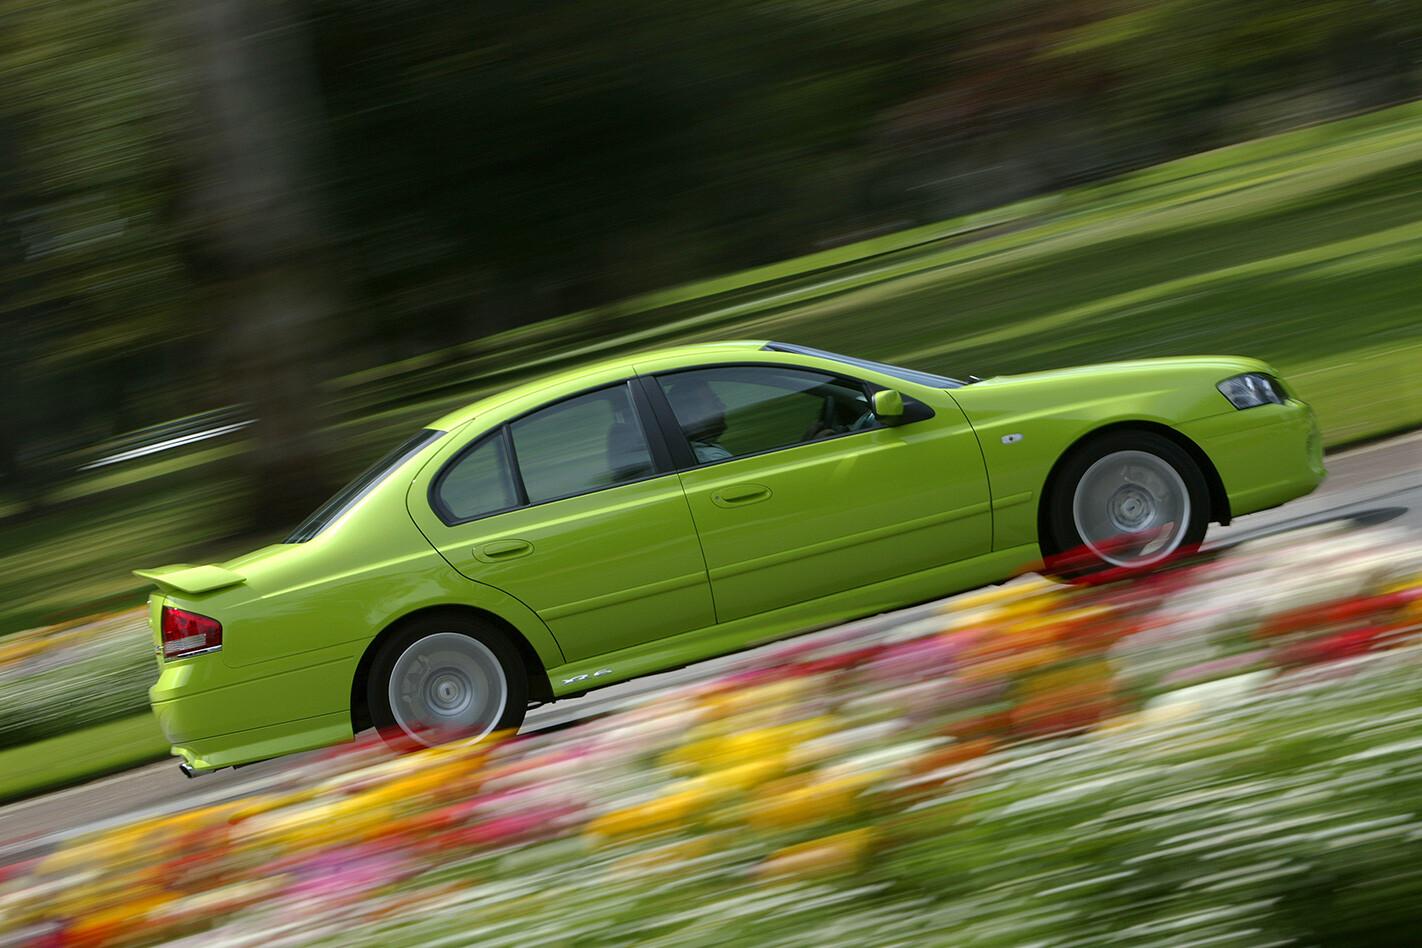 BF-Ford-XR6-Turbo-Auto-main.jpg